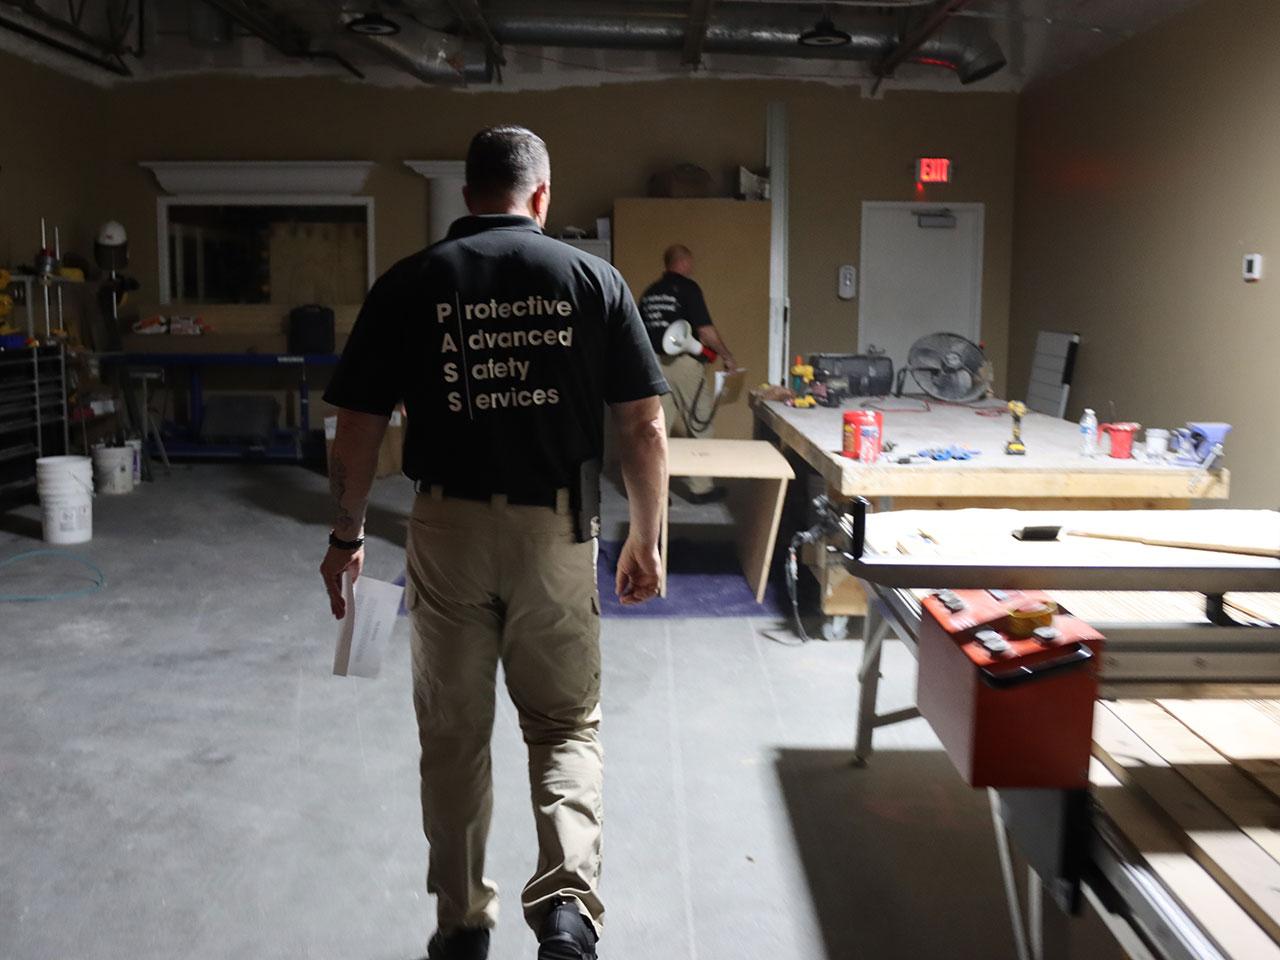 active shooter training, shooting walks building